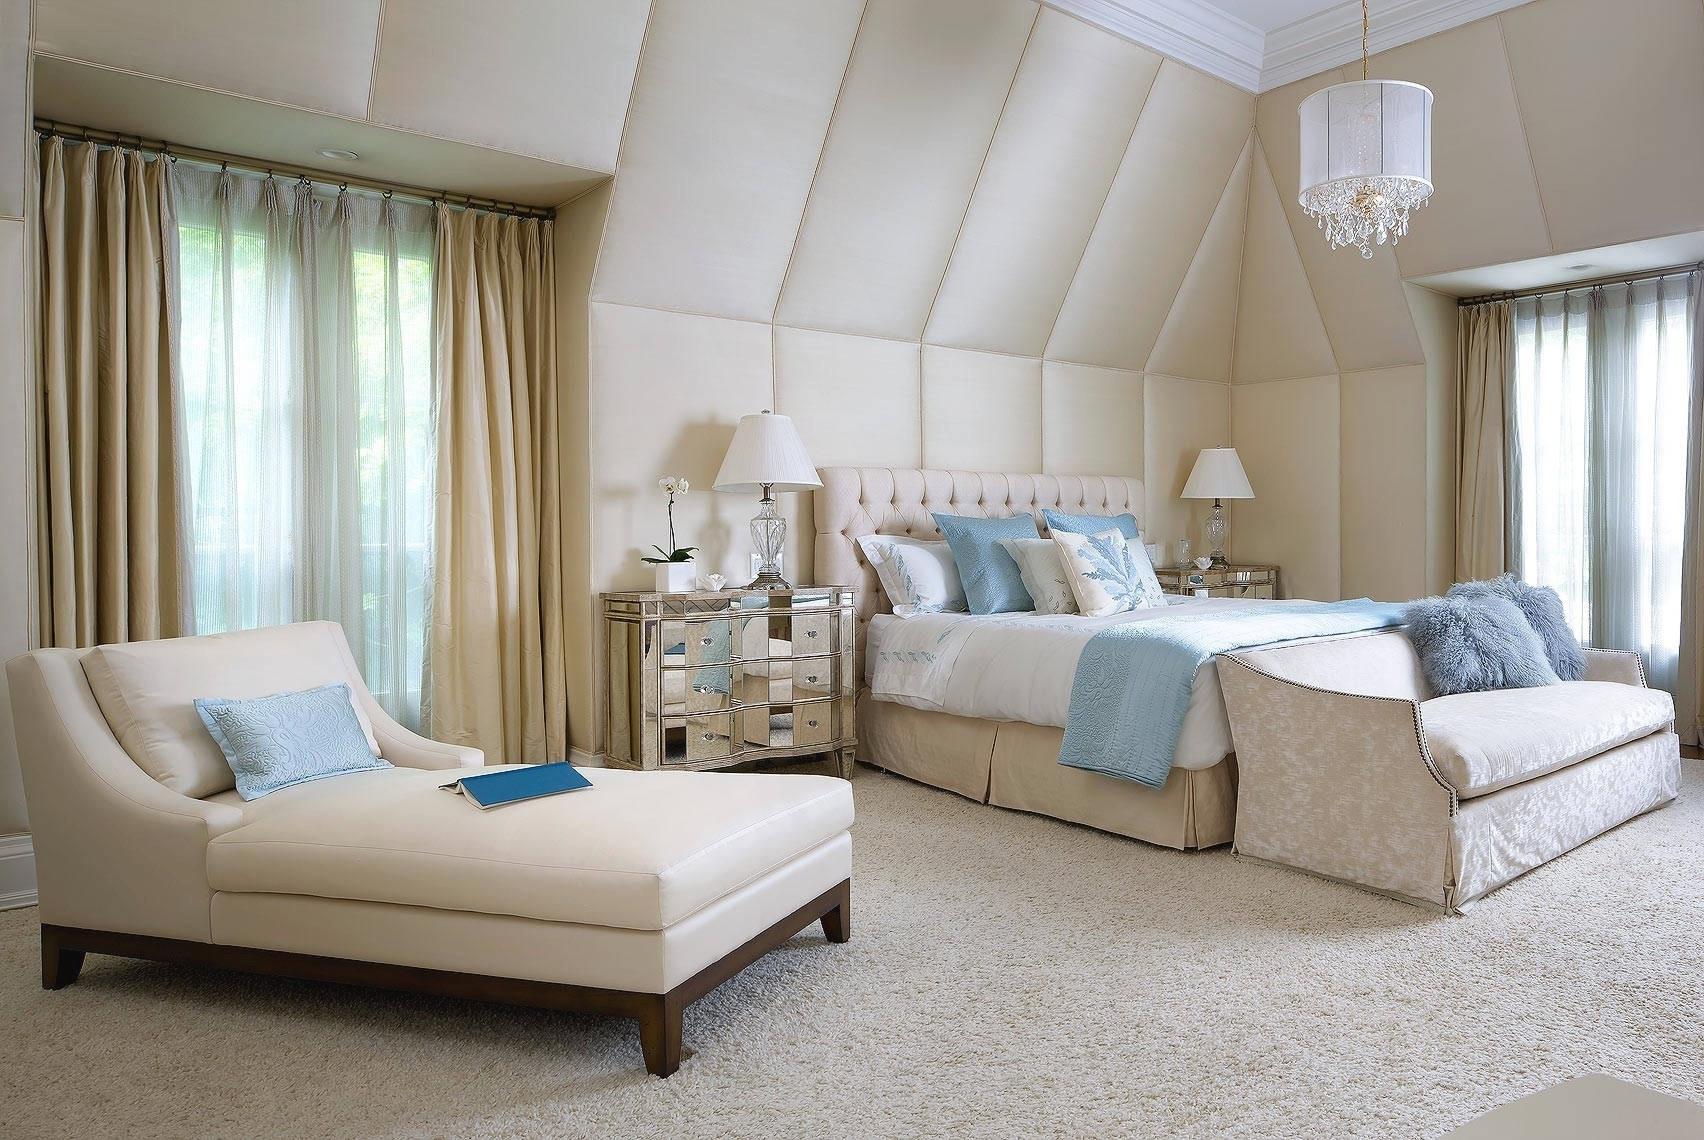 Home Design Ideas (View 8 of 15)